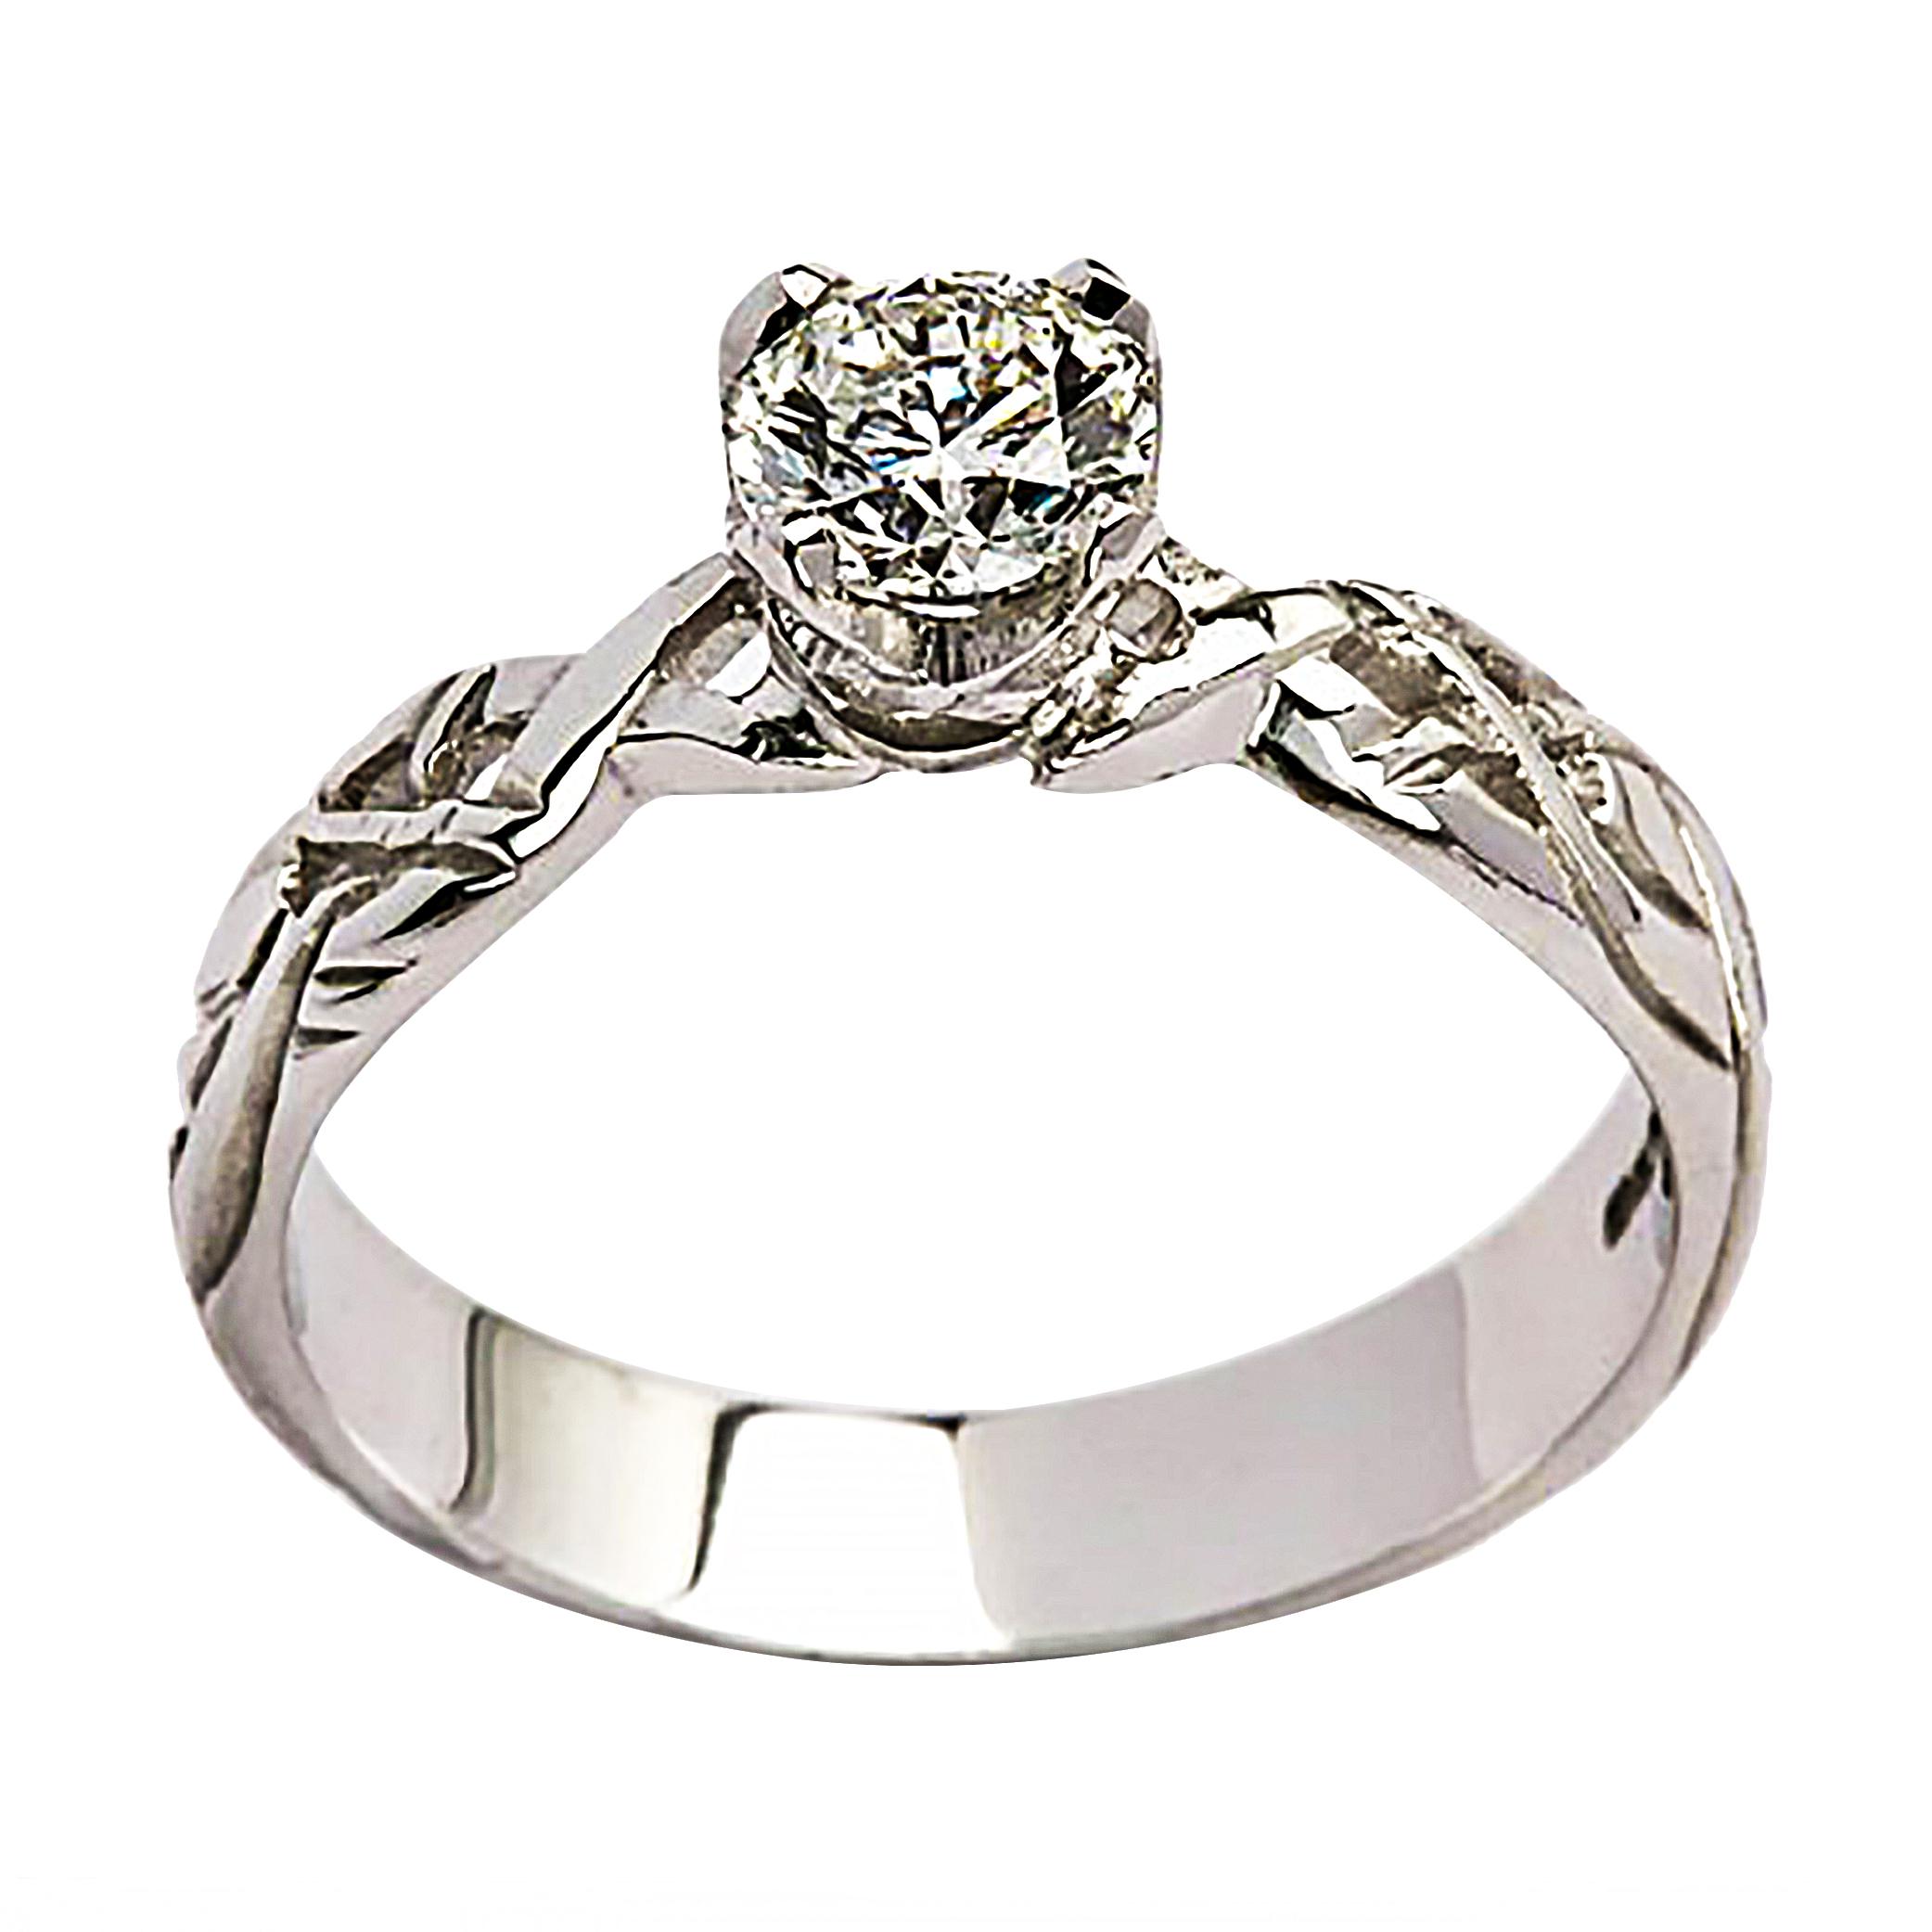 Irish Celtic Engagement Rings Diamond Rings